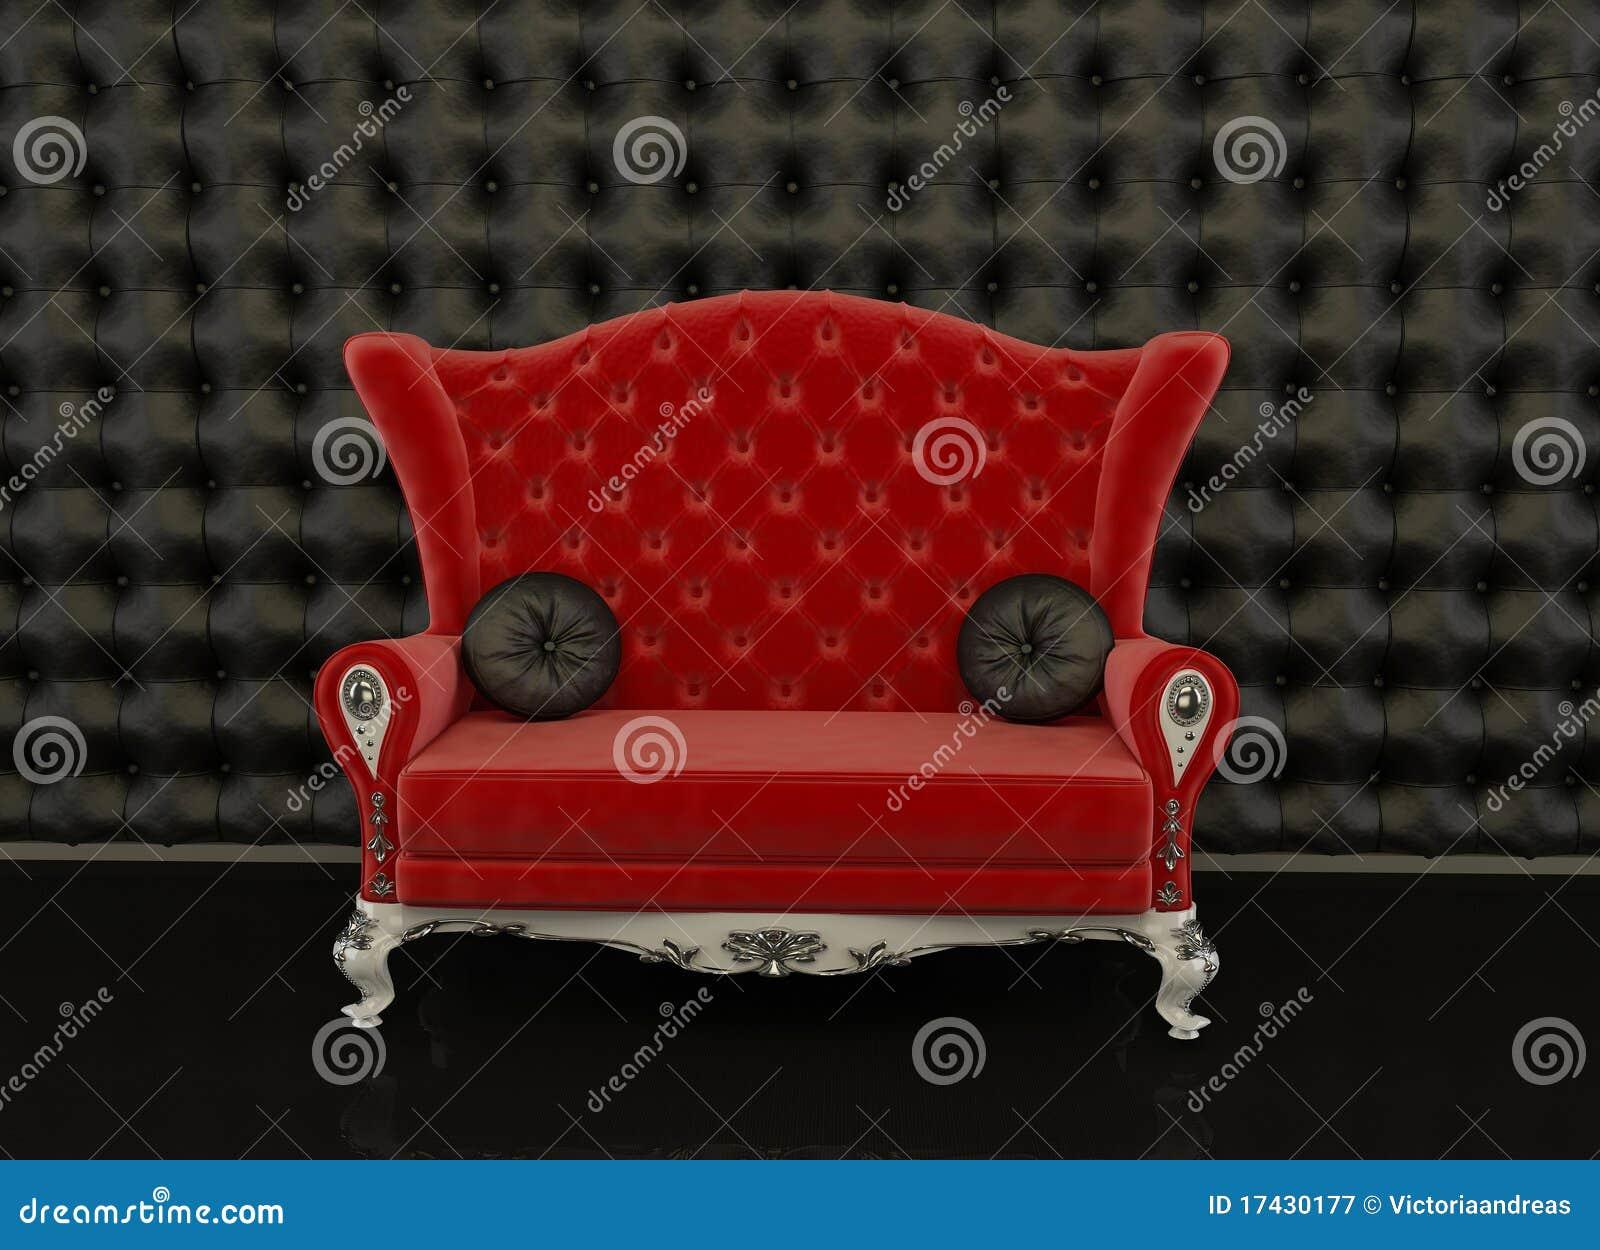 Red Sofa On A Black Background Stock Illustration Image